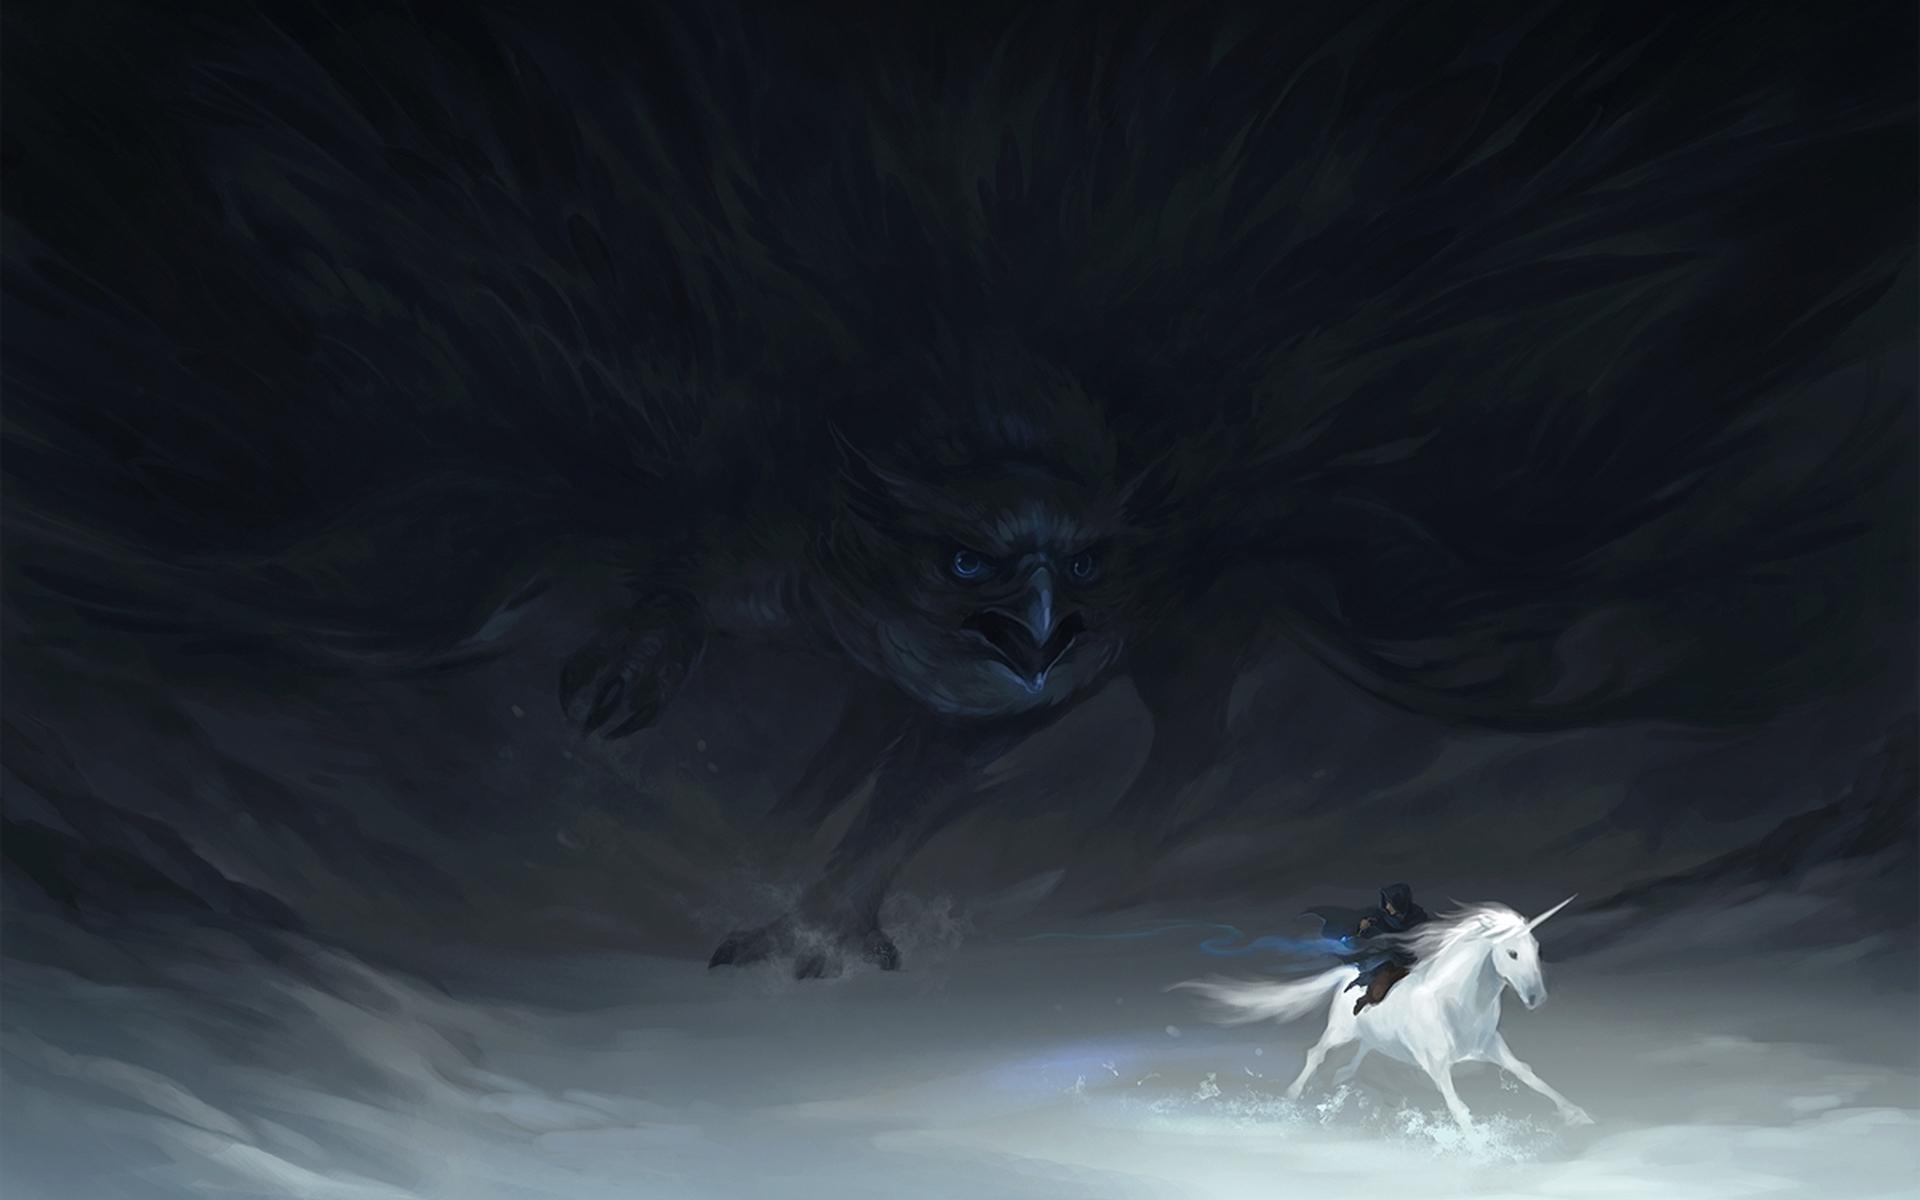 Fantasy art unicorn dark gothic bird raven wallpaper 1920x1200 1920x1200